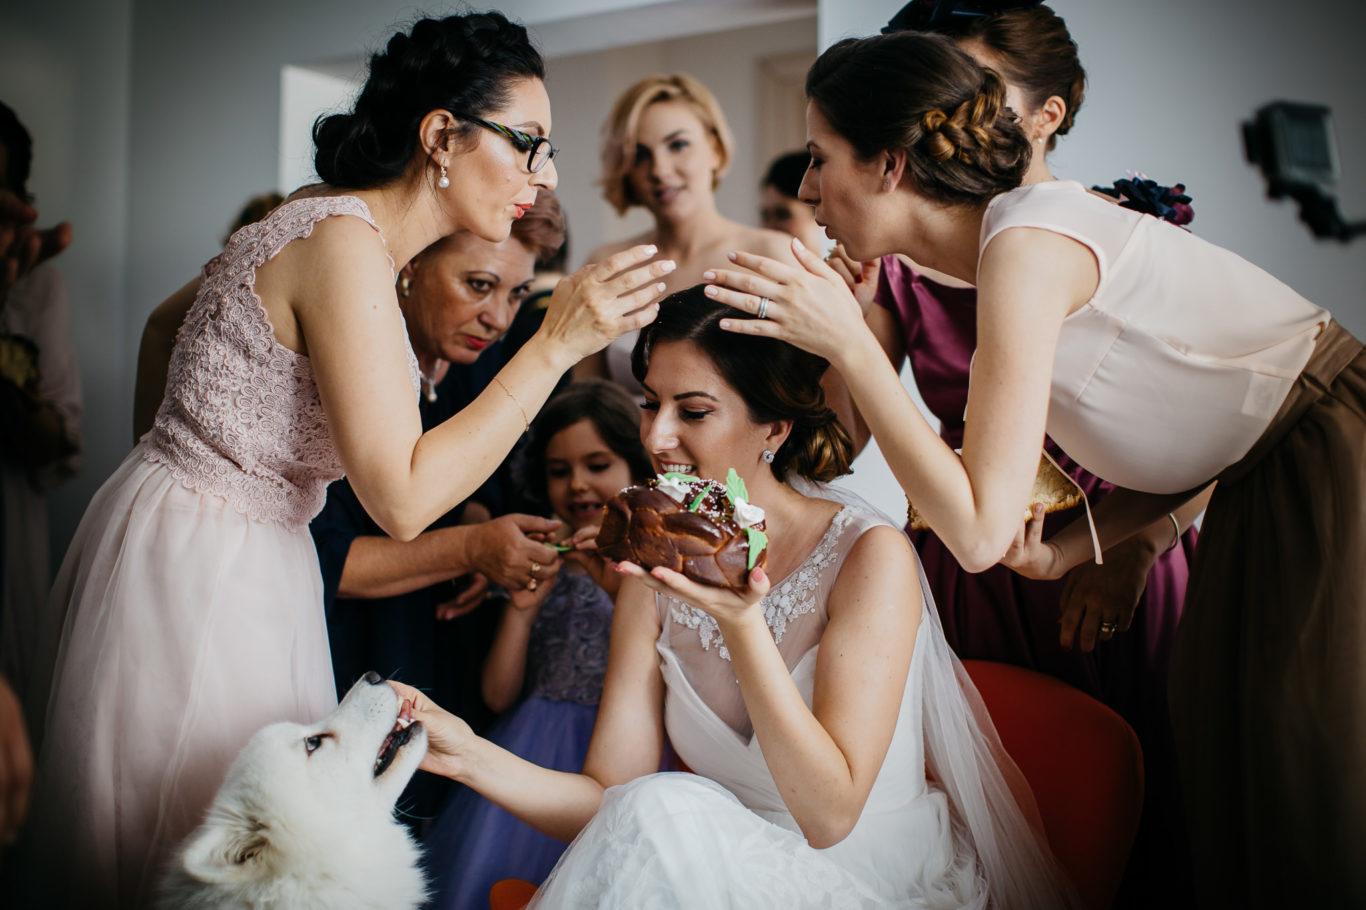 0230-Fotografie-nunta-Bucuresti-Oana-Catalin-fotograf-Ciprian-Dumitrescu-CDF_0341